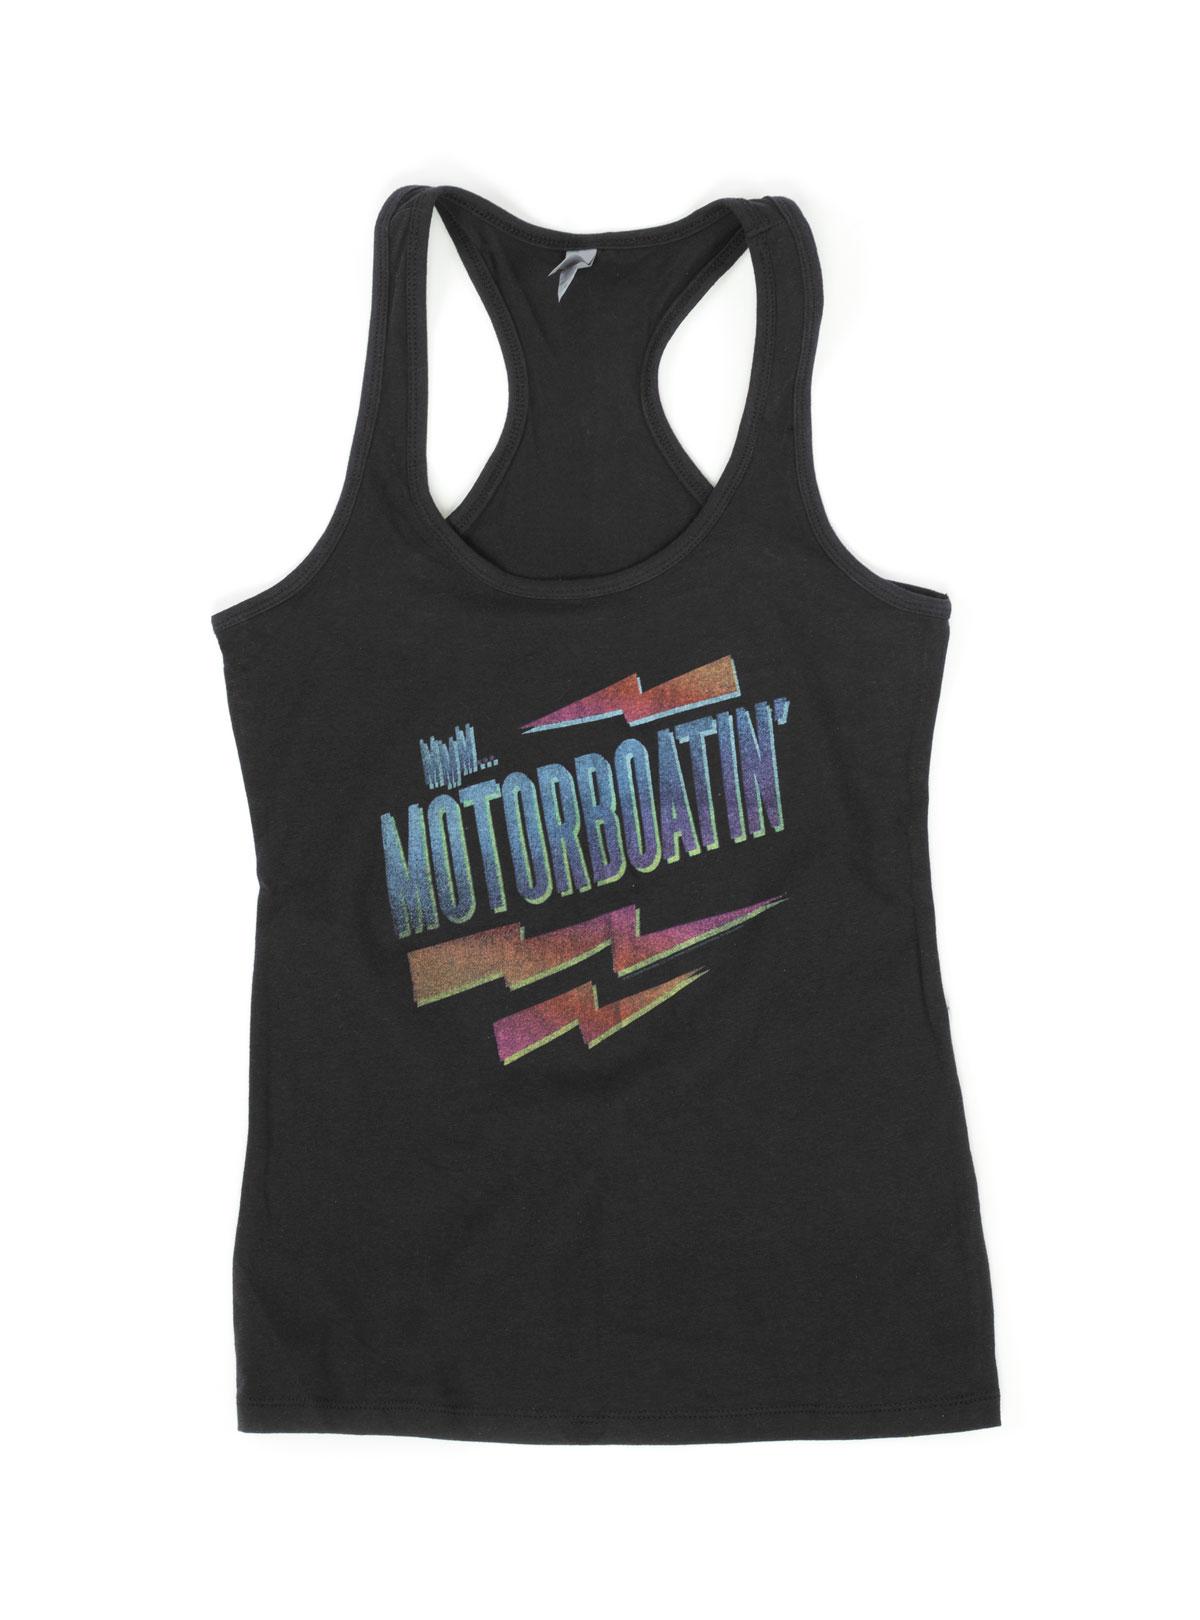 Motorboatin Black Tank Top